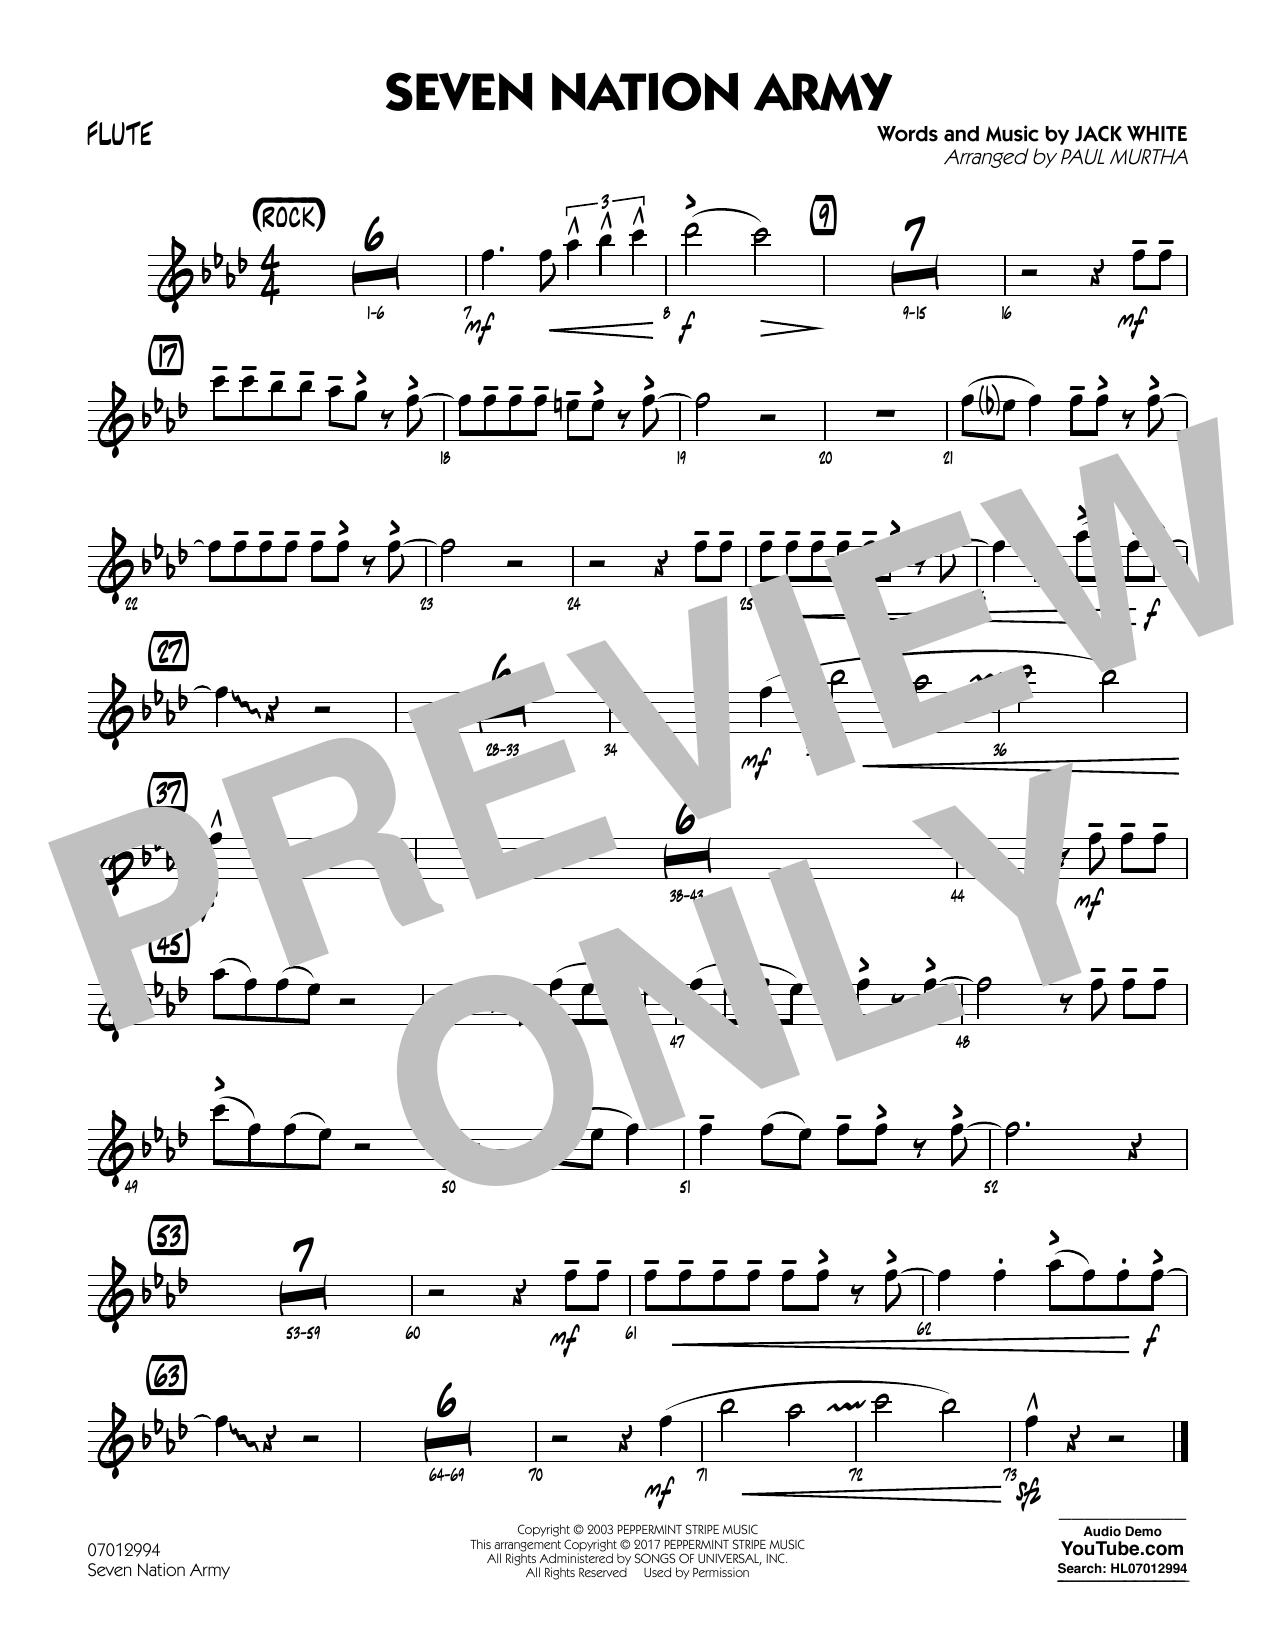 Seven Nation Army - Flute atStanton's Sheet Music